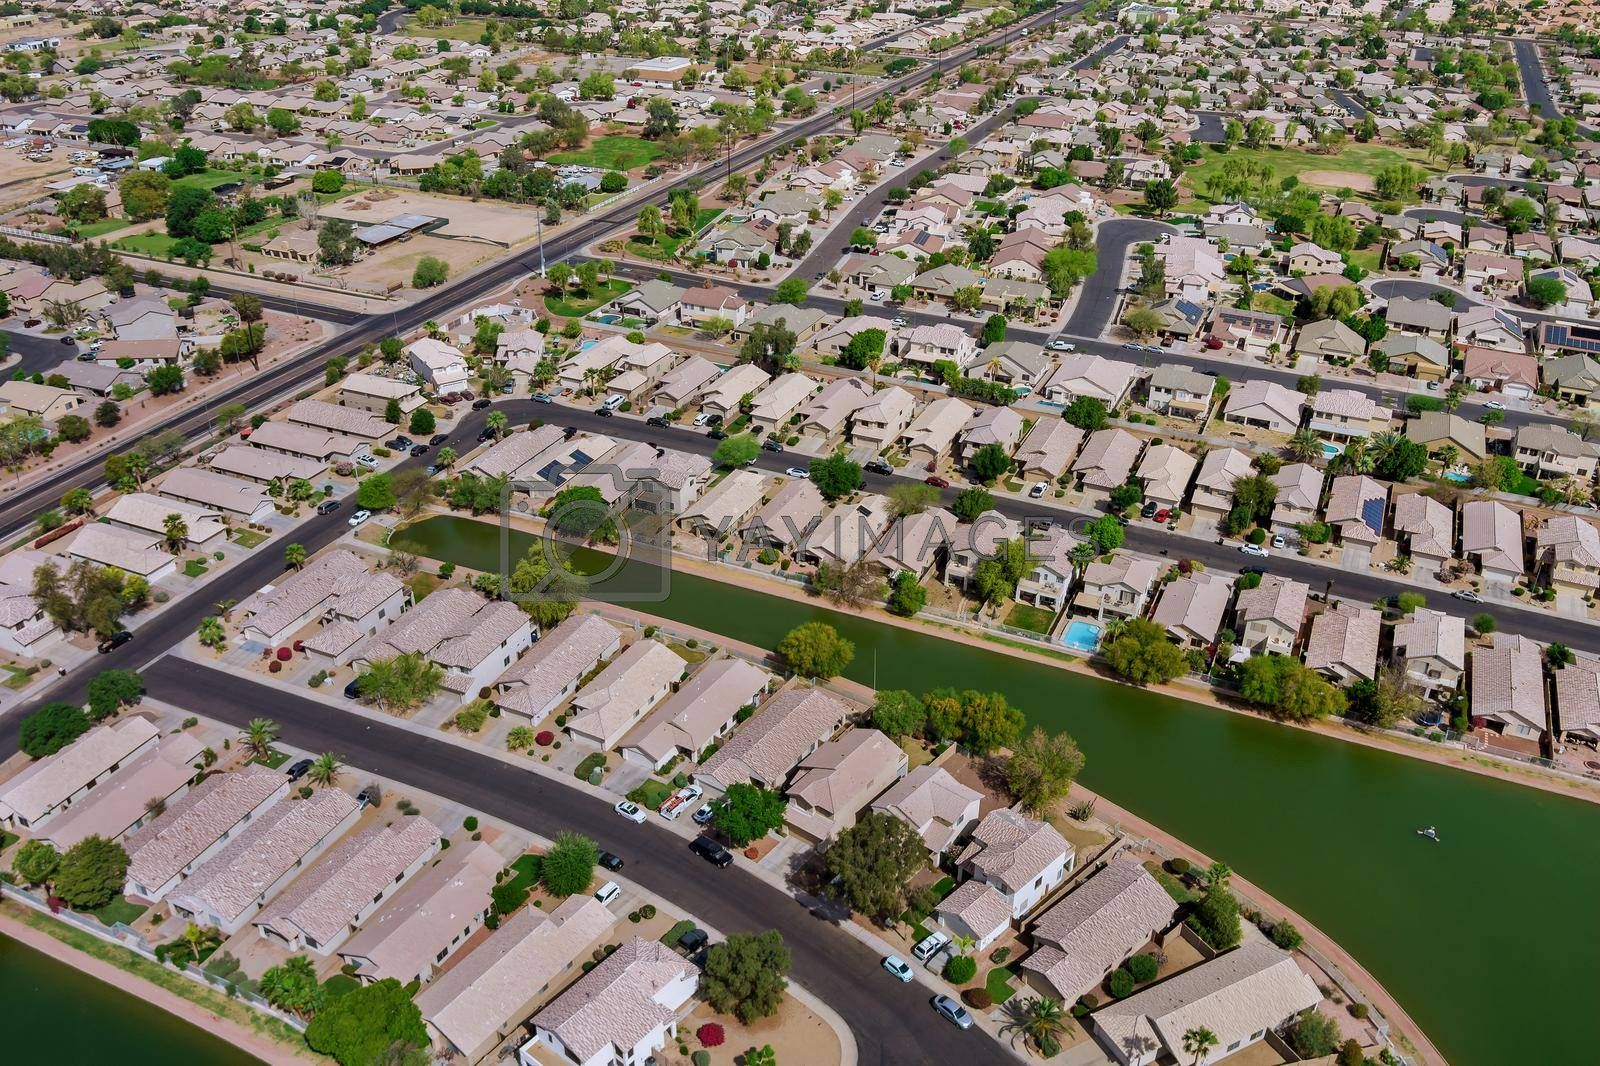 Many small ponds near Avondale small town a view overlooking desert near on of state capital Phoenix Arizona USA